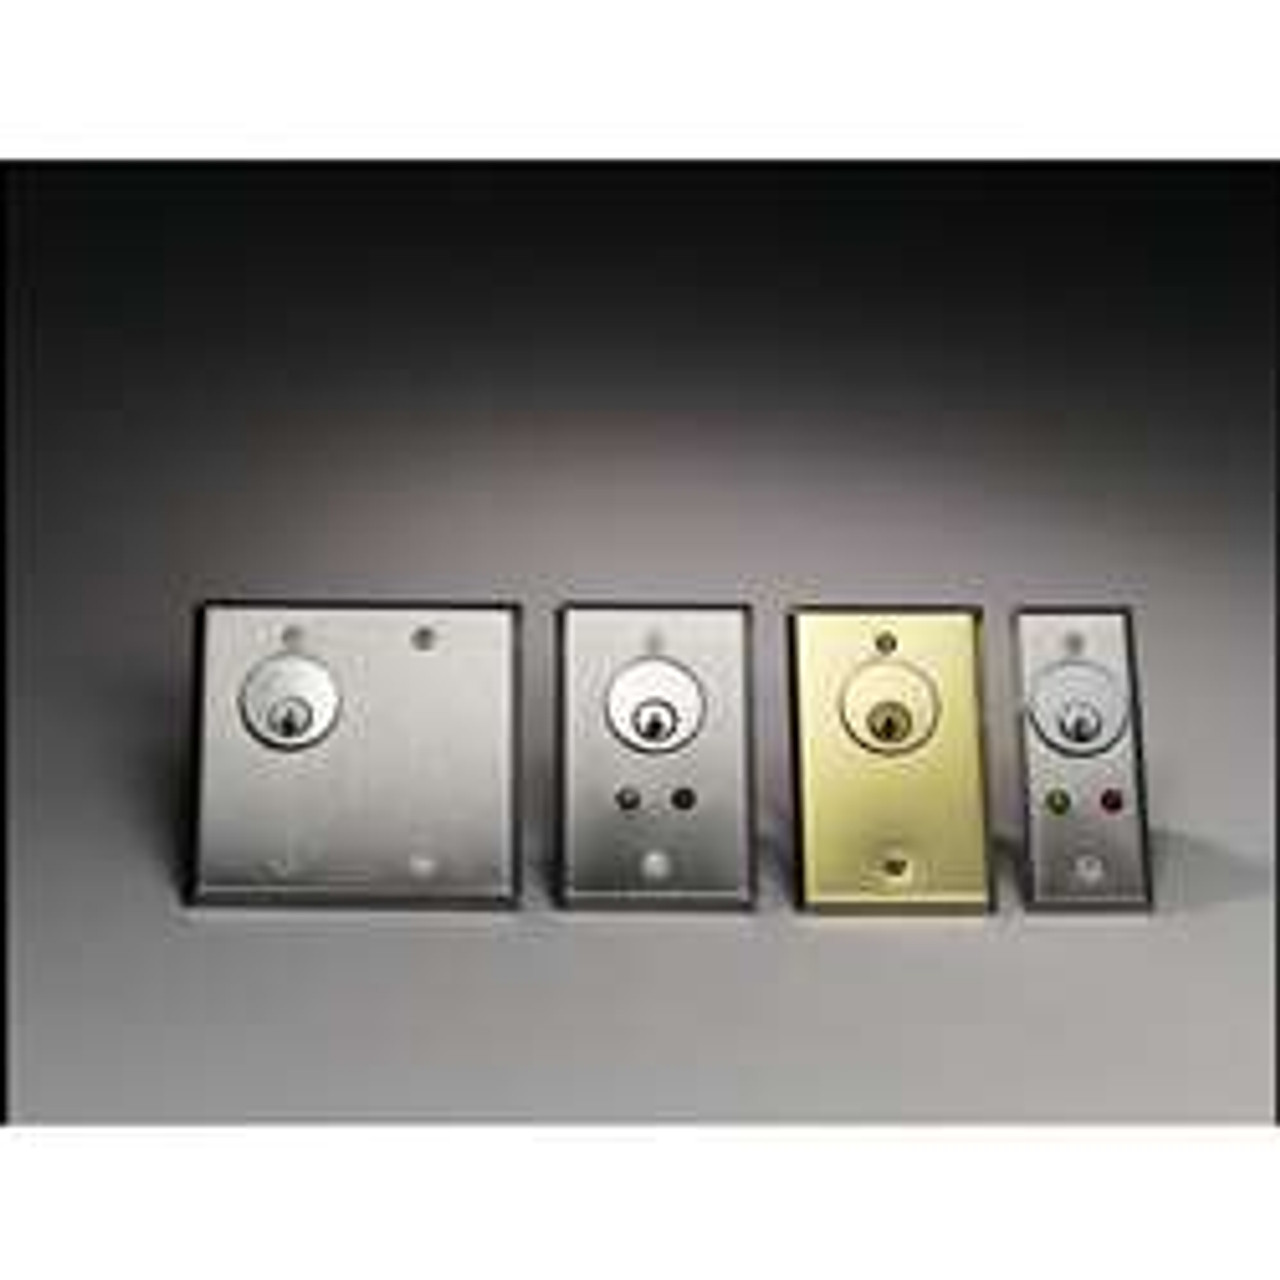 Dortronics 5141 24xkxl 5100 Series Key Switch Controls